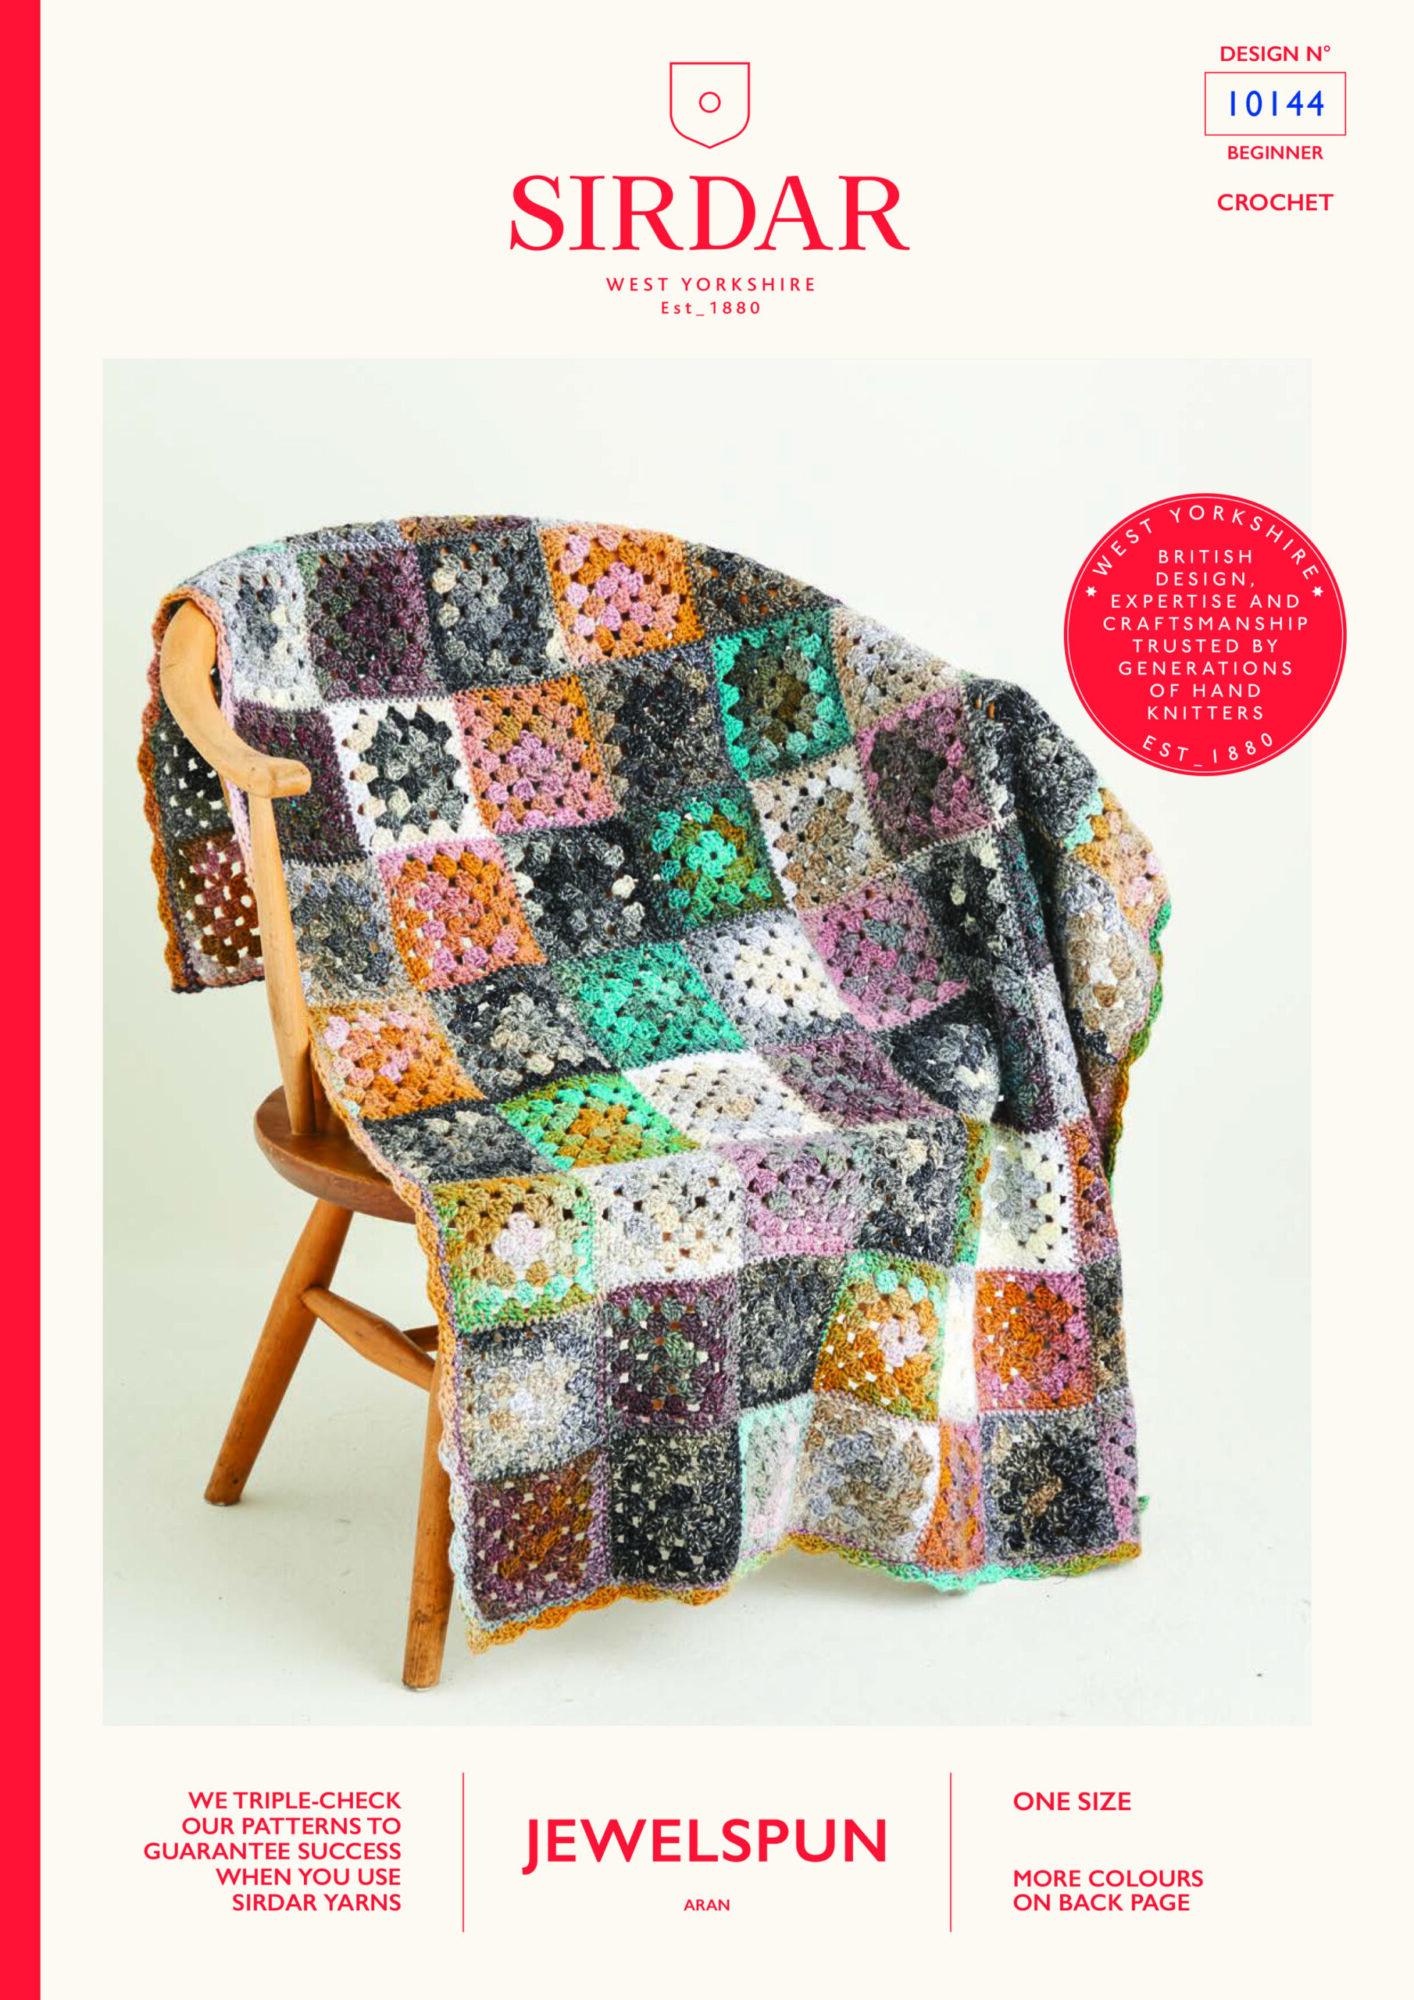 Sirdar Pattern Jewelspun  10144 (Download) product image